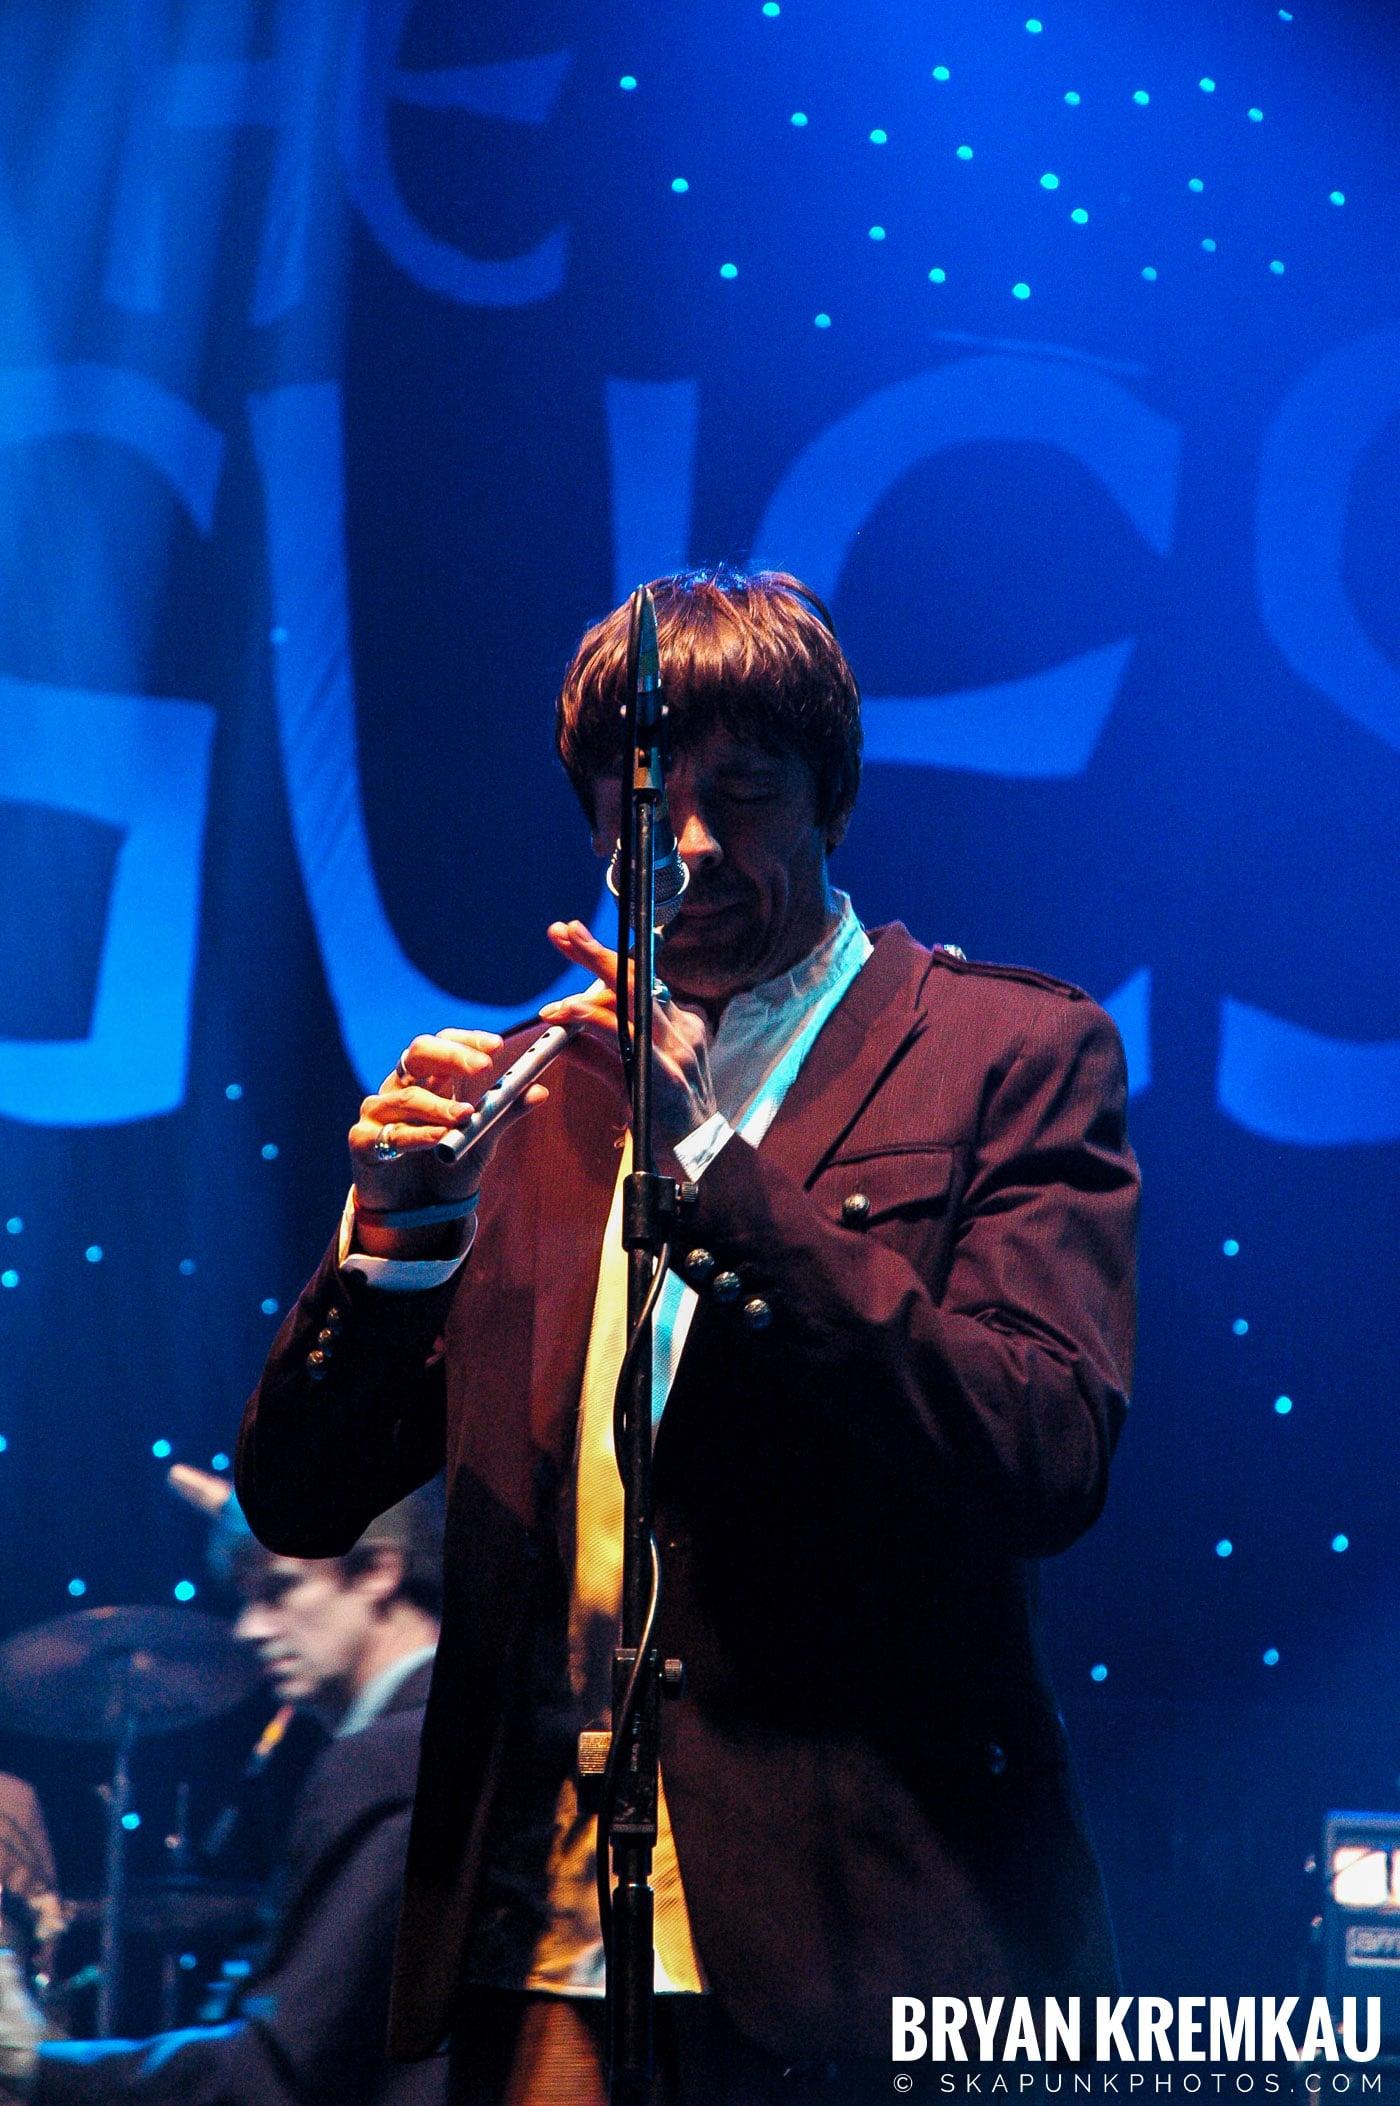 The Pogues @ Brixton Academy, London UK - 12.19.05 (30)